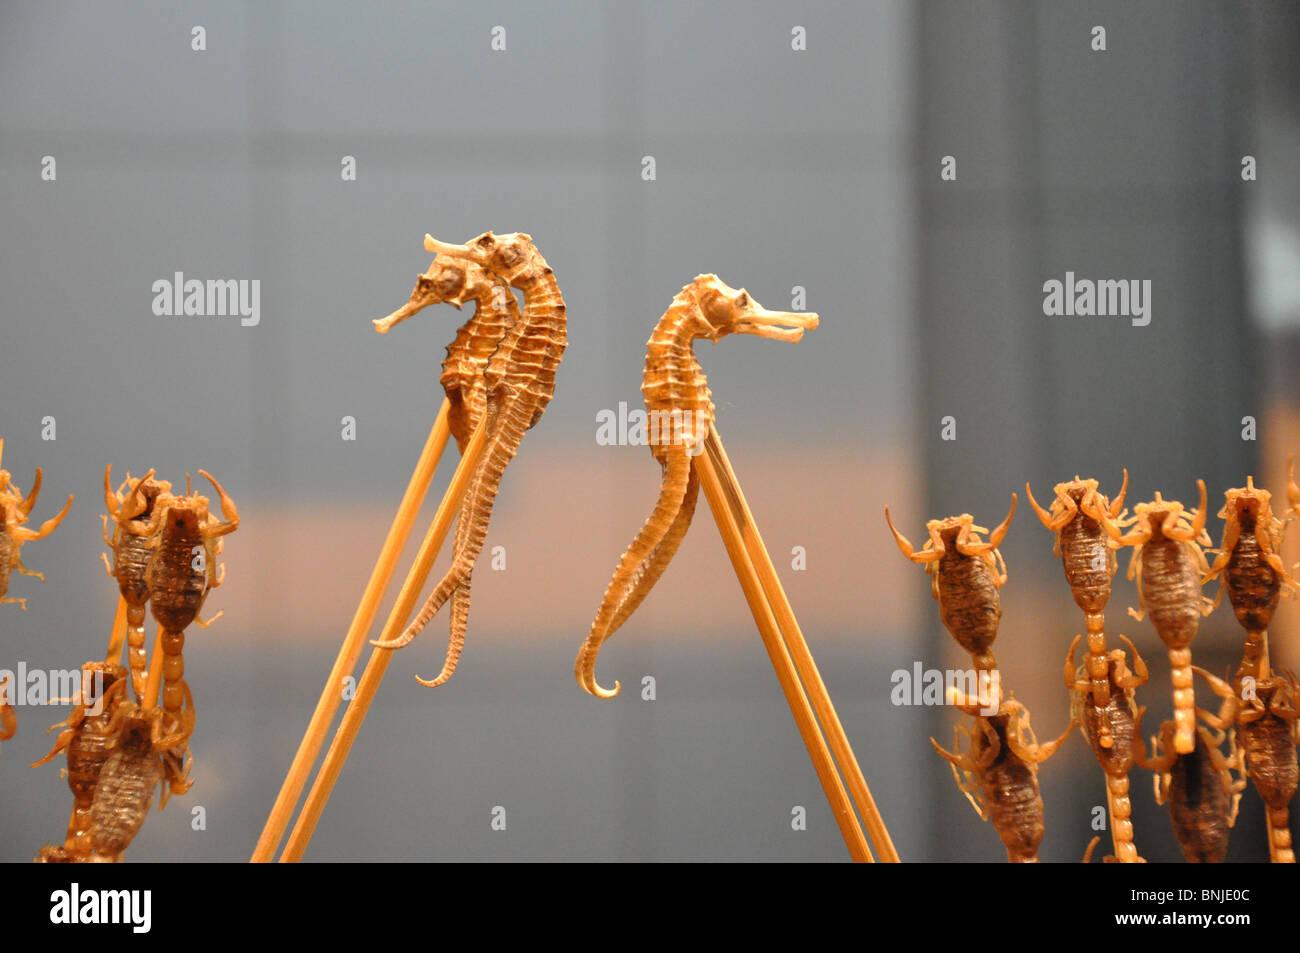 Seahorse and Scorpion snacks for sale, Wangfujing, Beijing, China